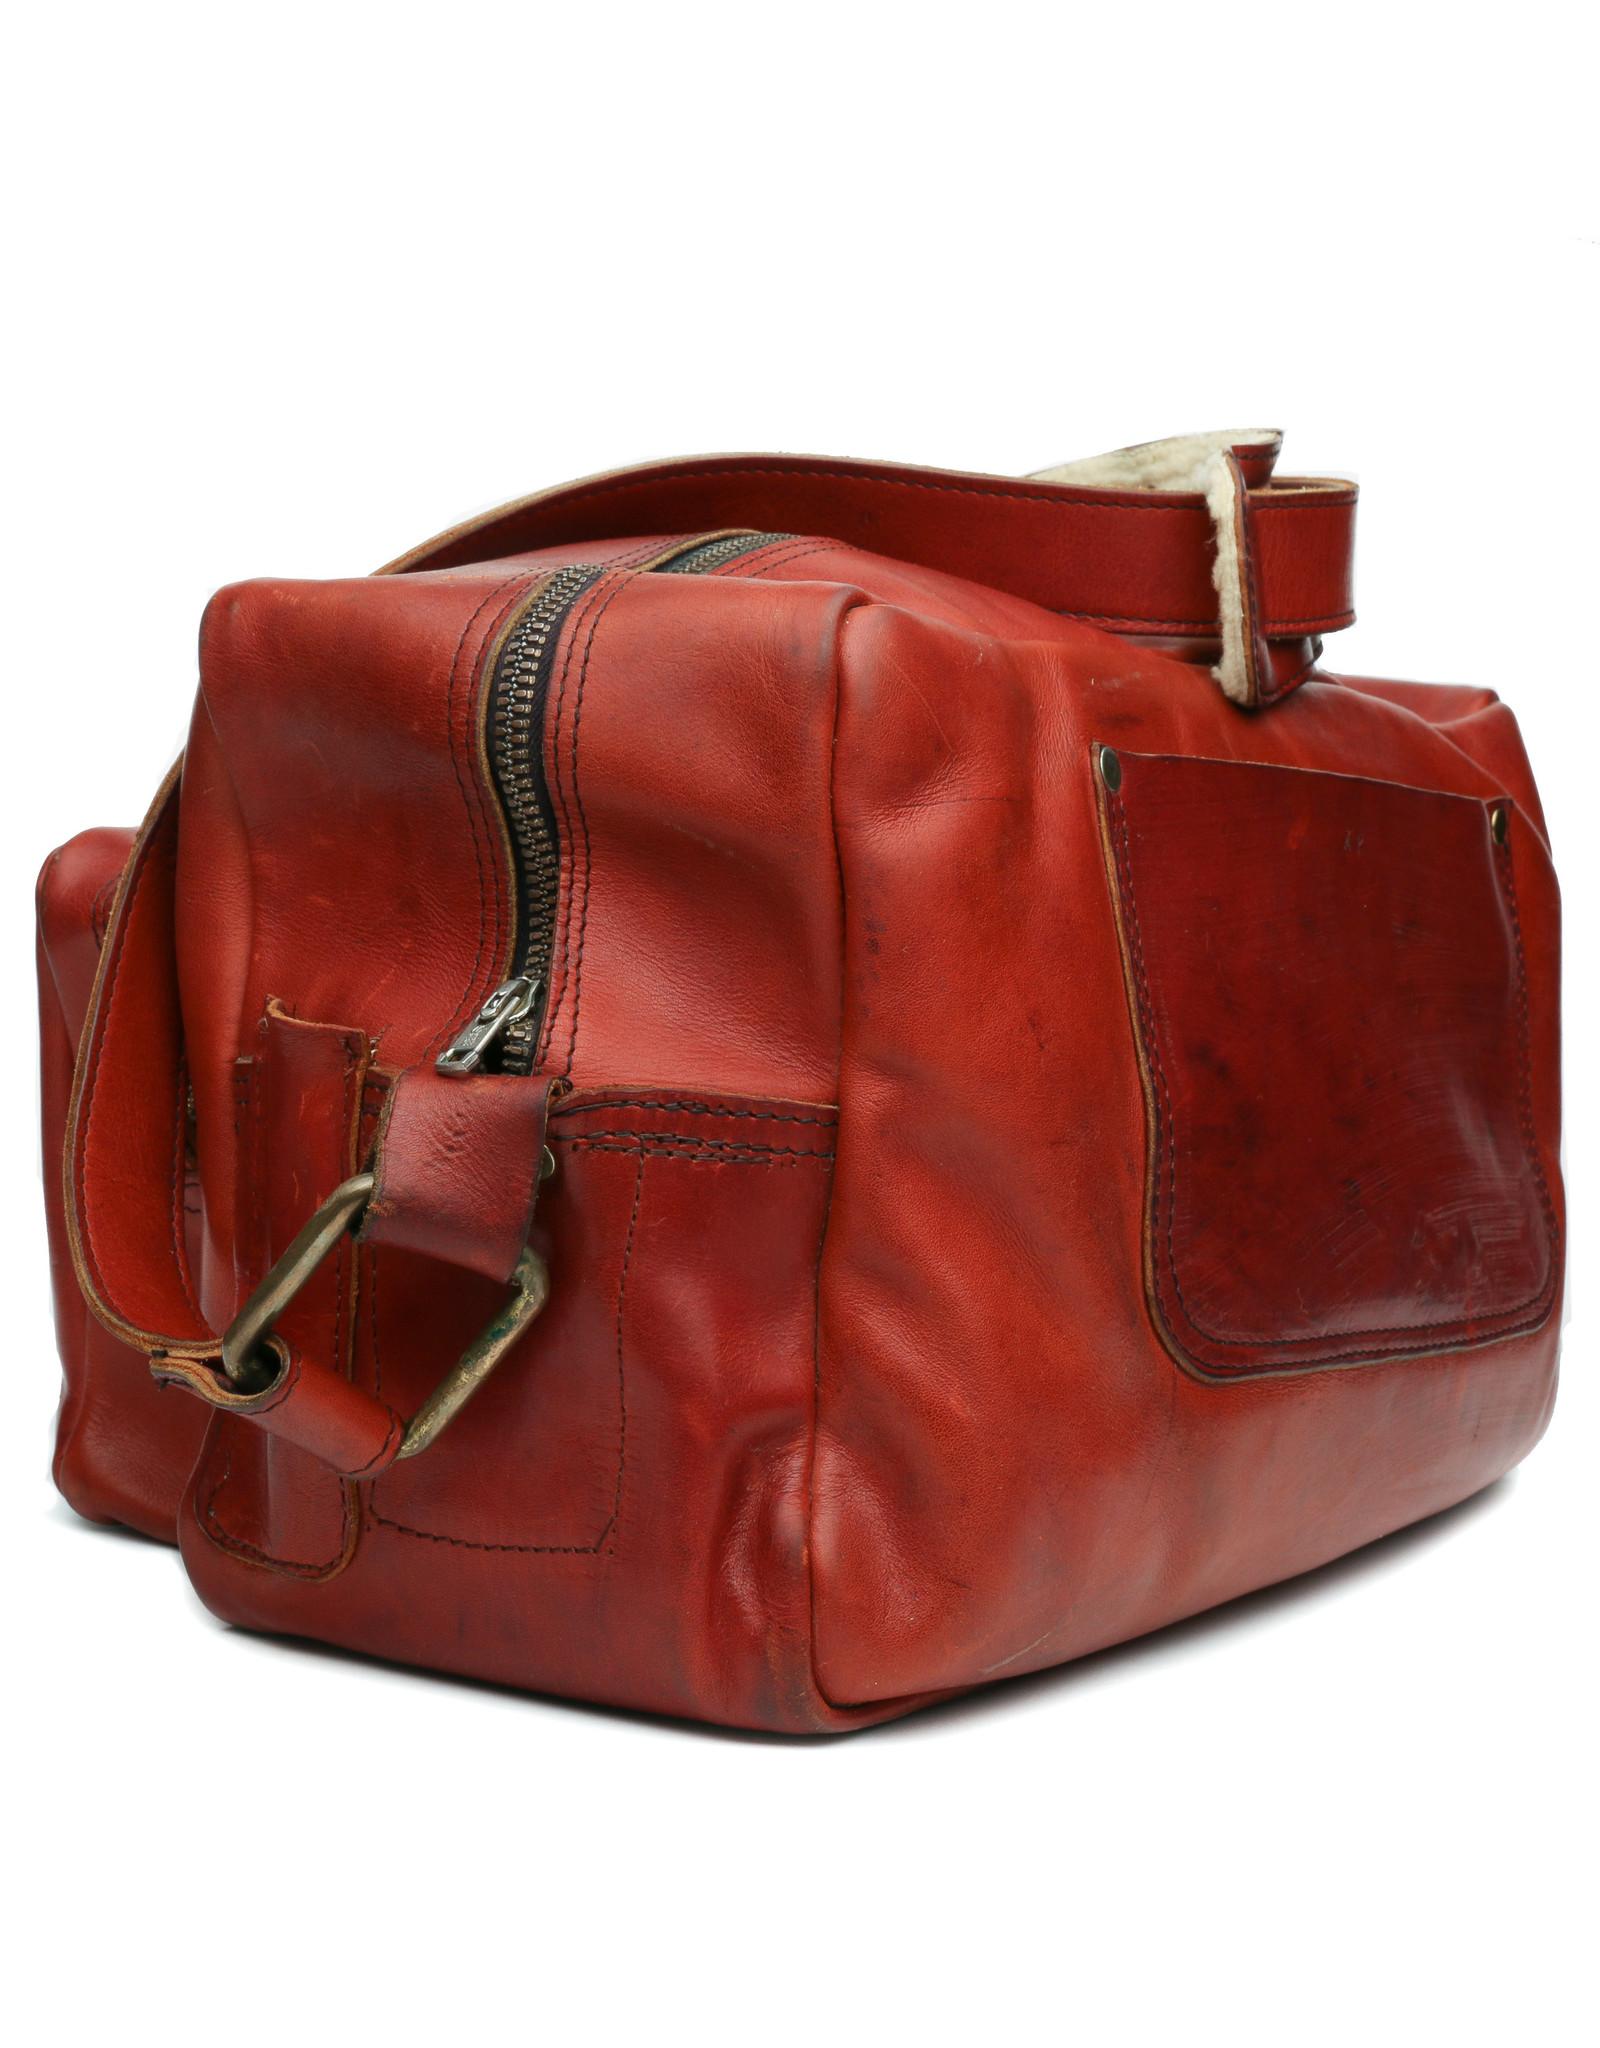 acme camera Vintage Soft Sided Leather camera bag Large